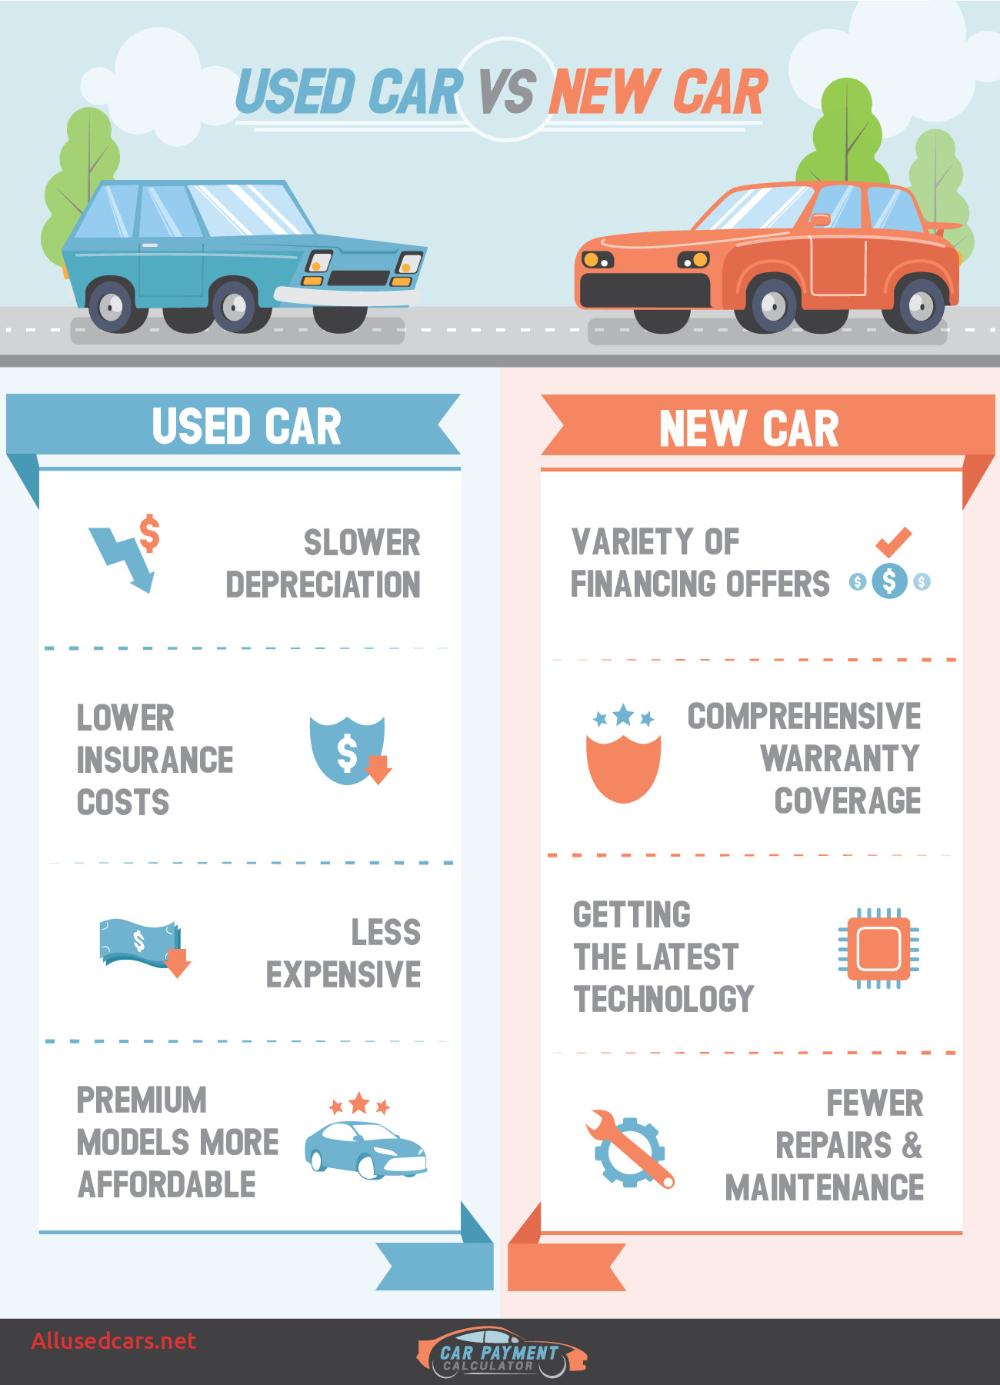 Auto Loan Calculator With Trade Fresh Car Depreciation Calculator Calculate Straightline Car Payment Car Payment Calculator Car Loan Calculator